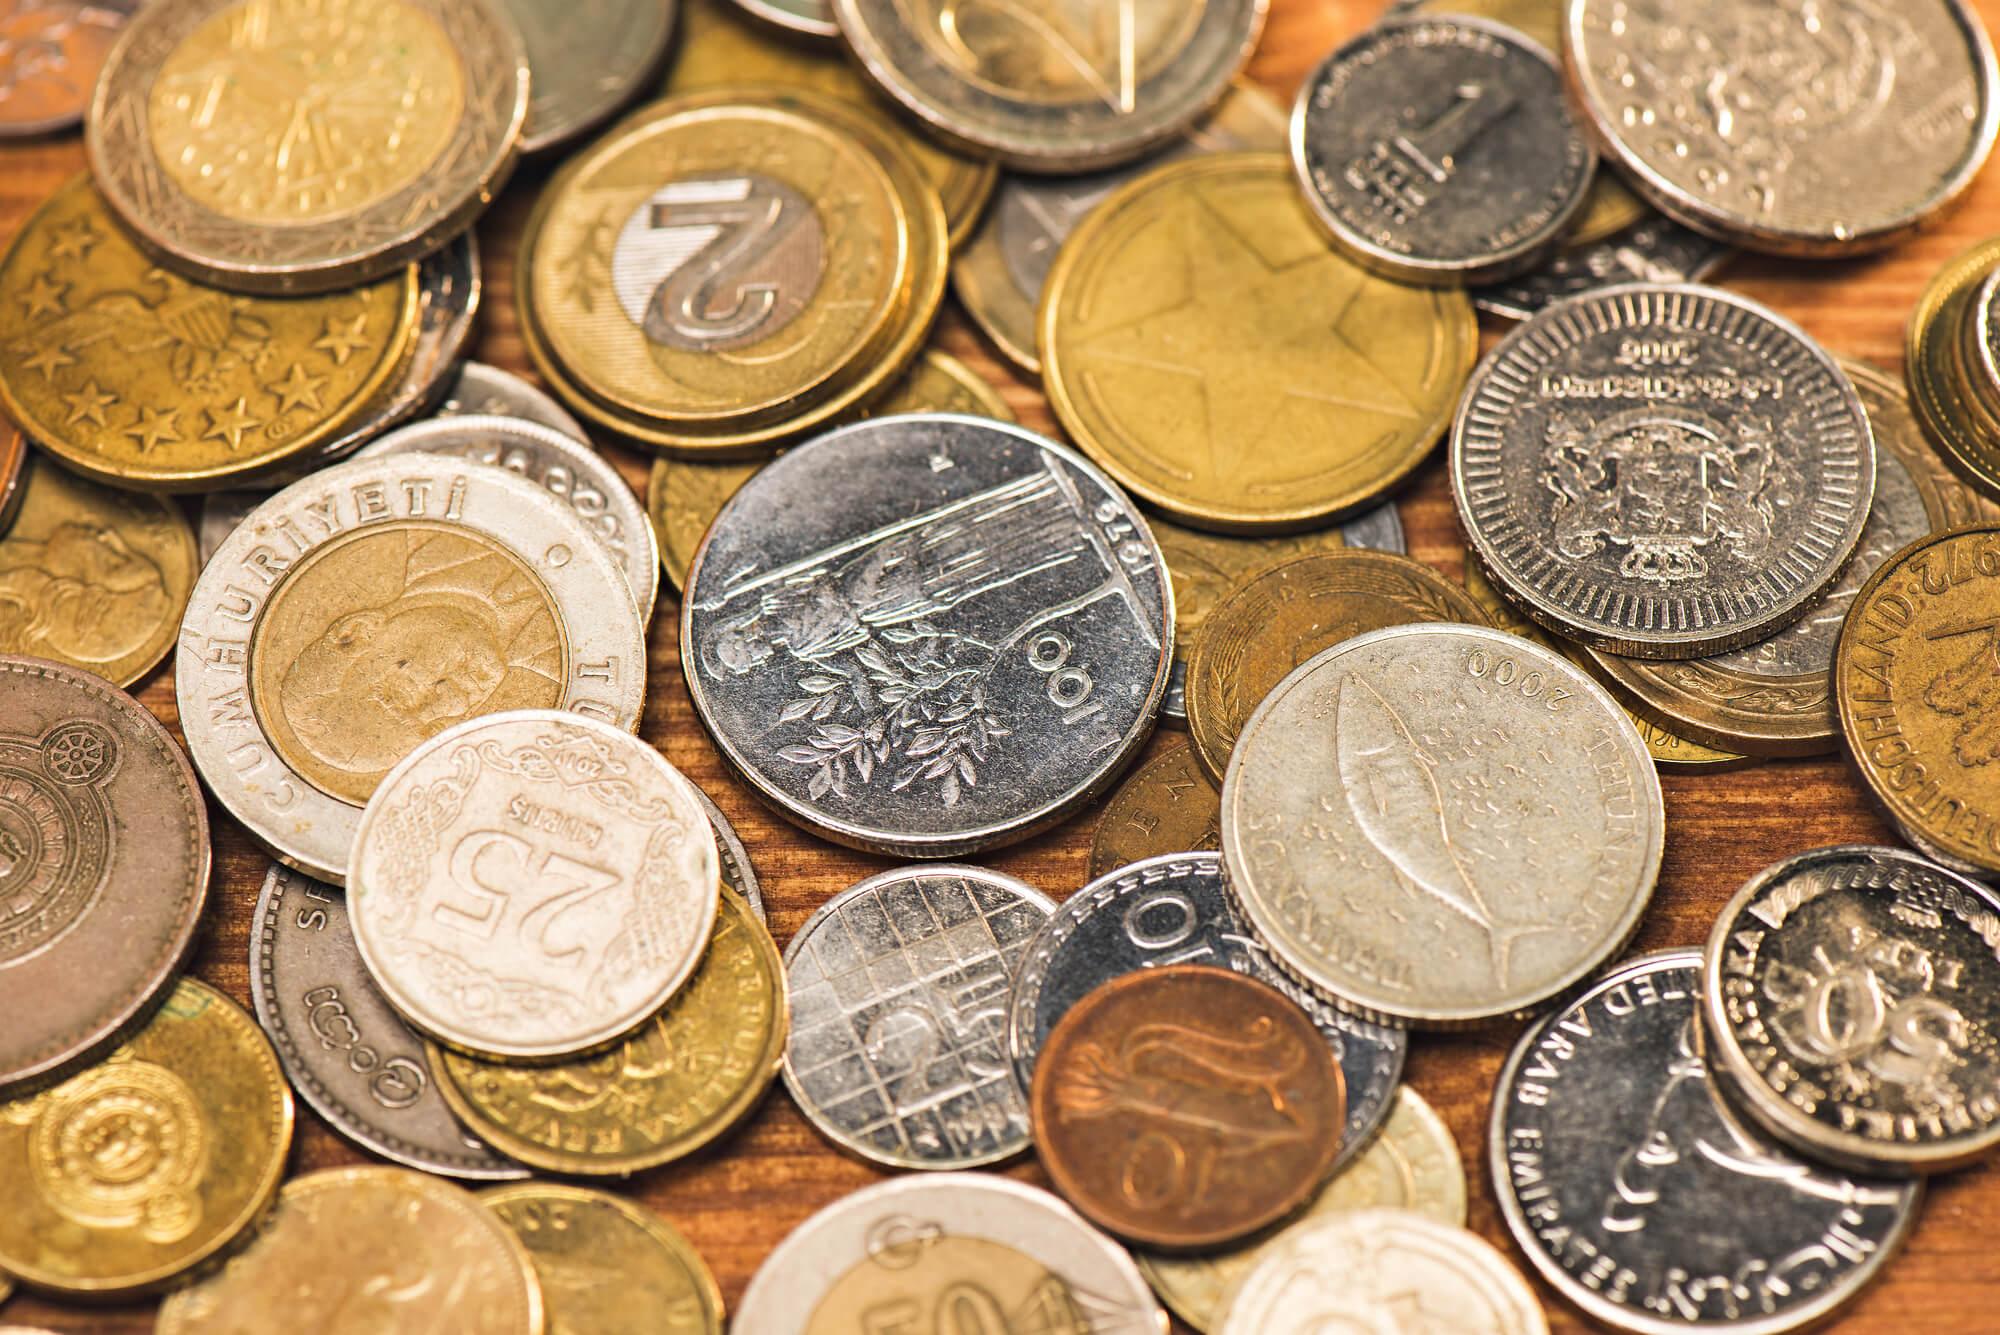 coins US Mint West Palm Beach